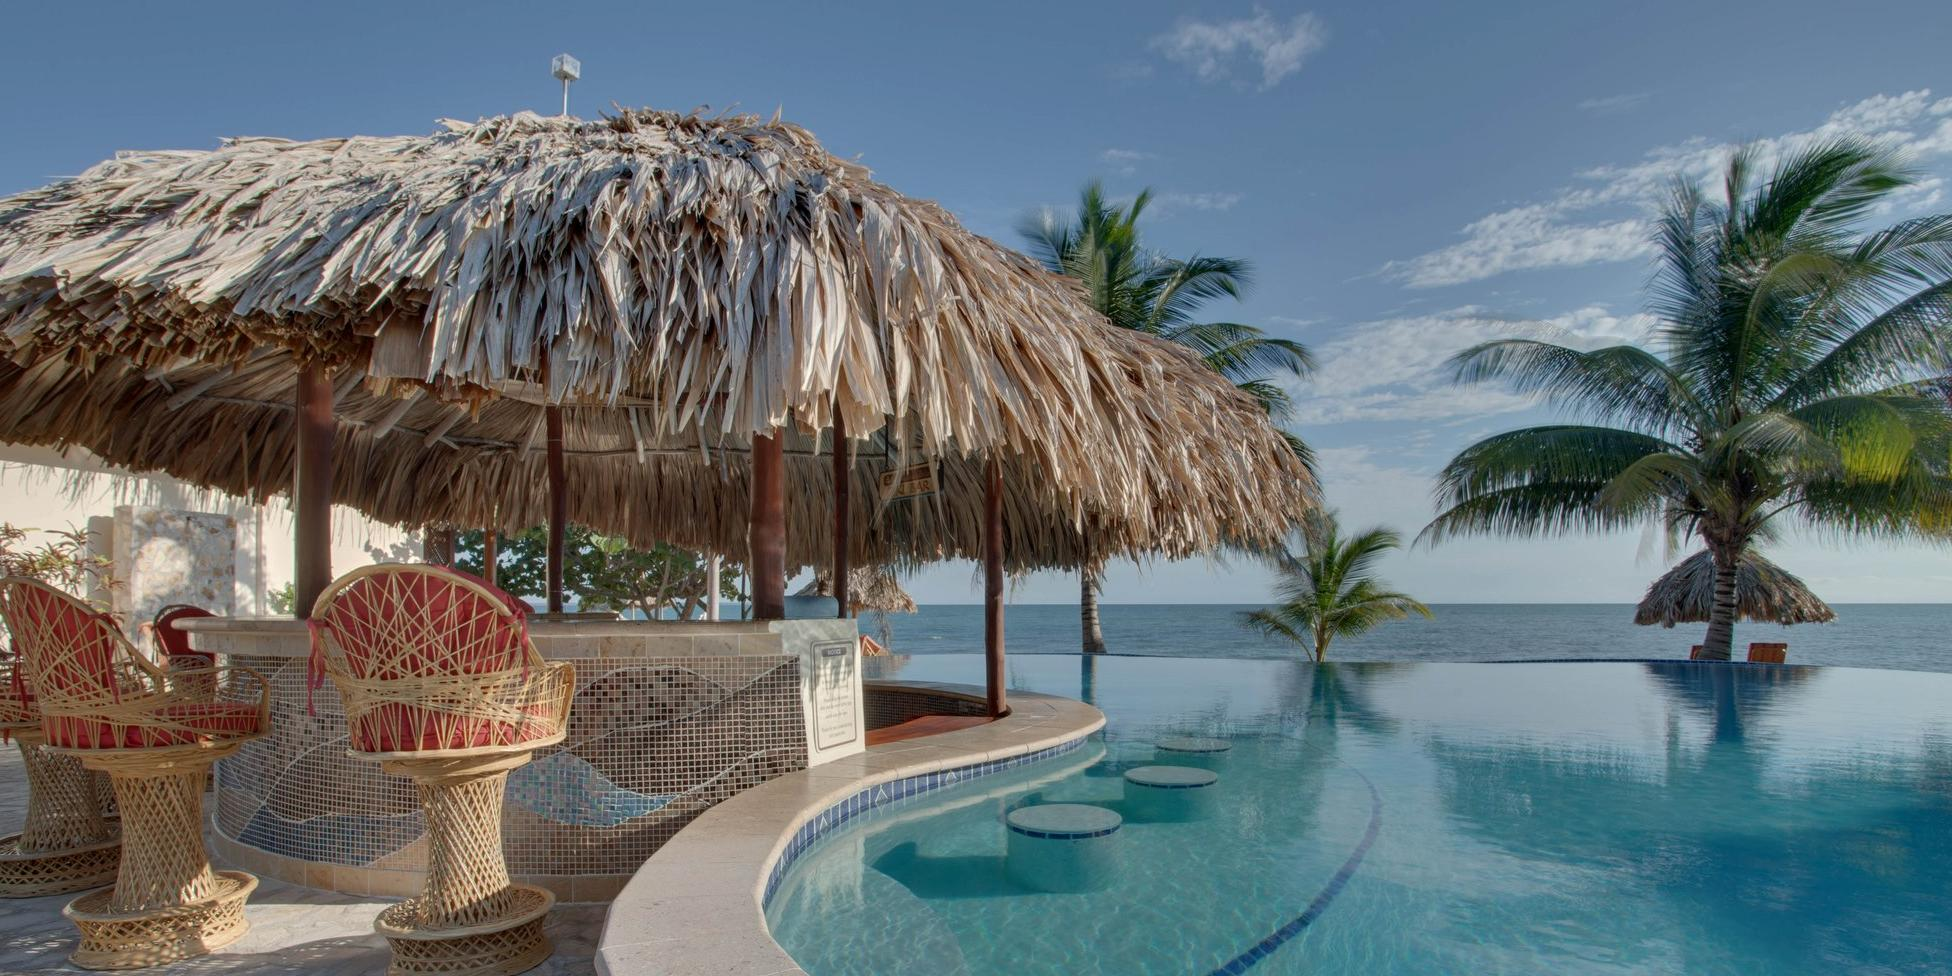 Almond Beach Resort (Belize)